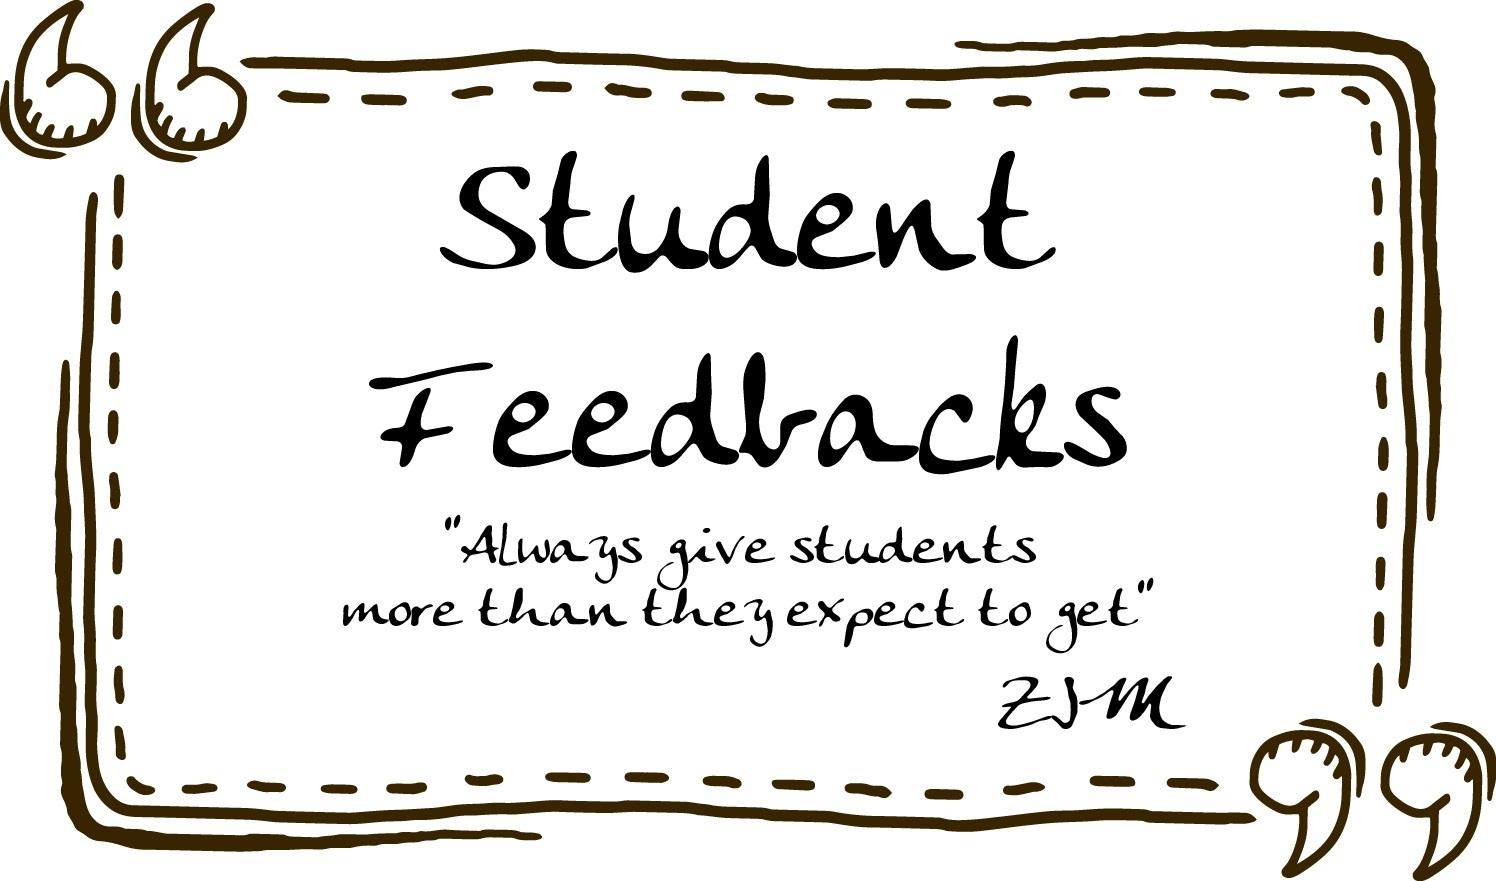 Feedback của học viên